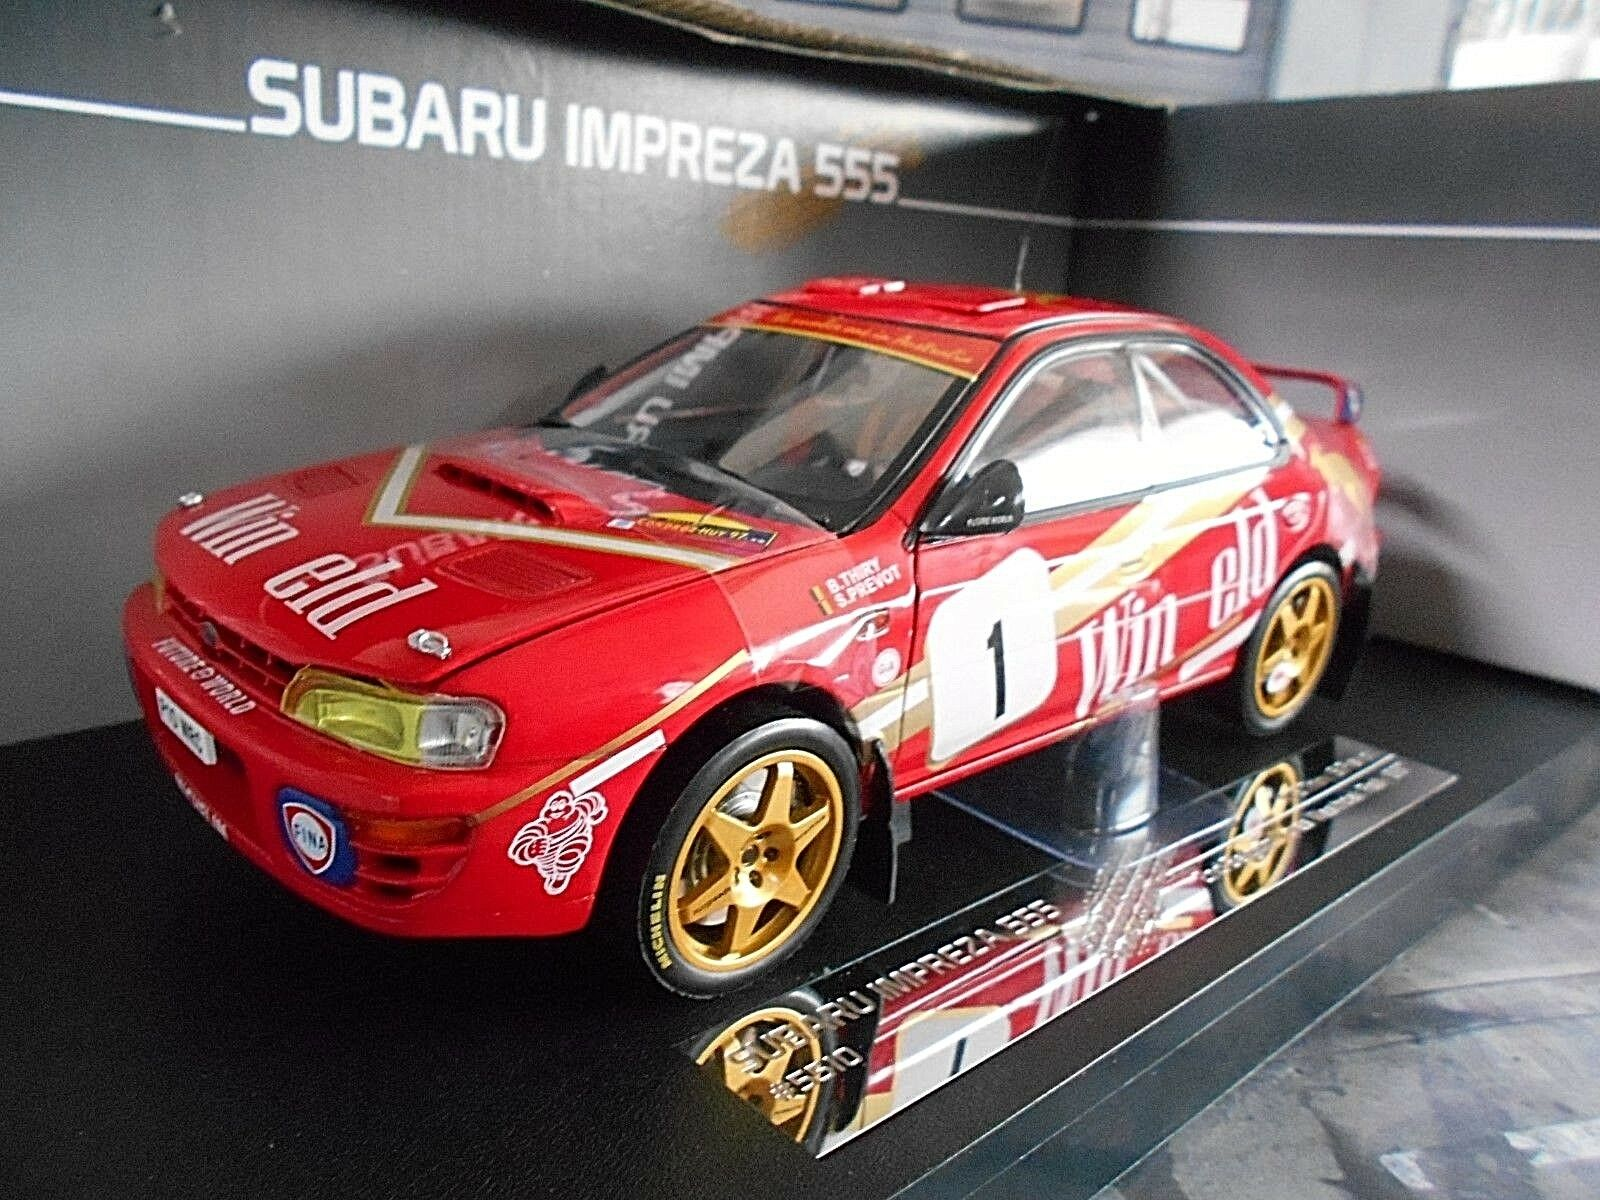 SUBARU IMPREZA WRC RALLYE  1 Thiry PREVOT Winfield Vimy Ypres 97 Sunstar 1 18